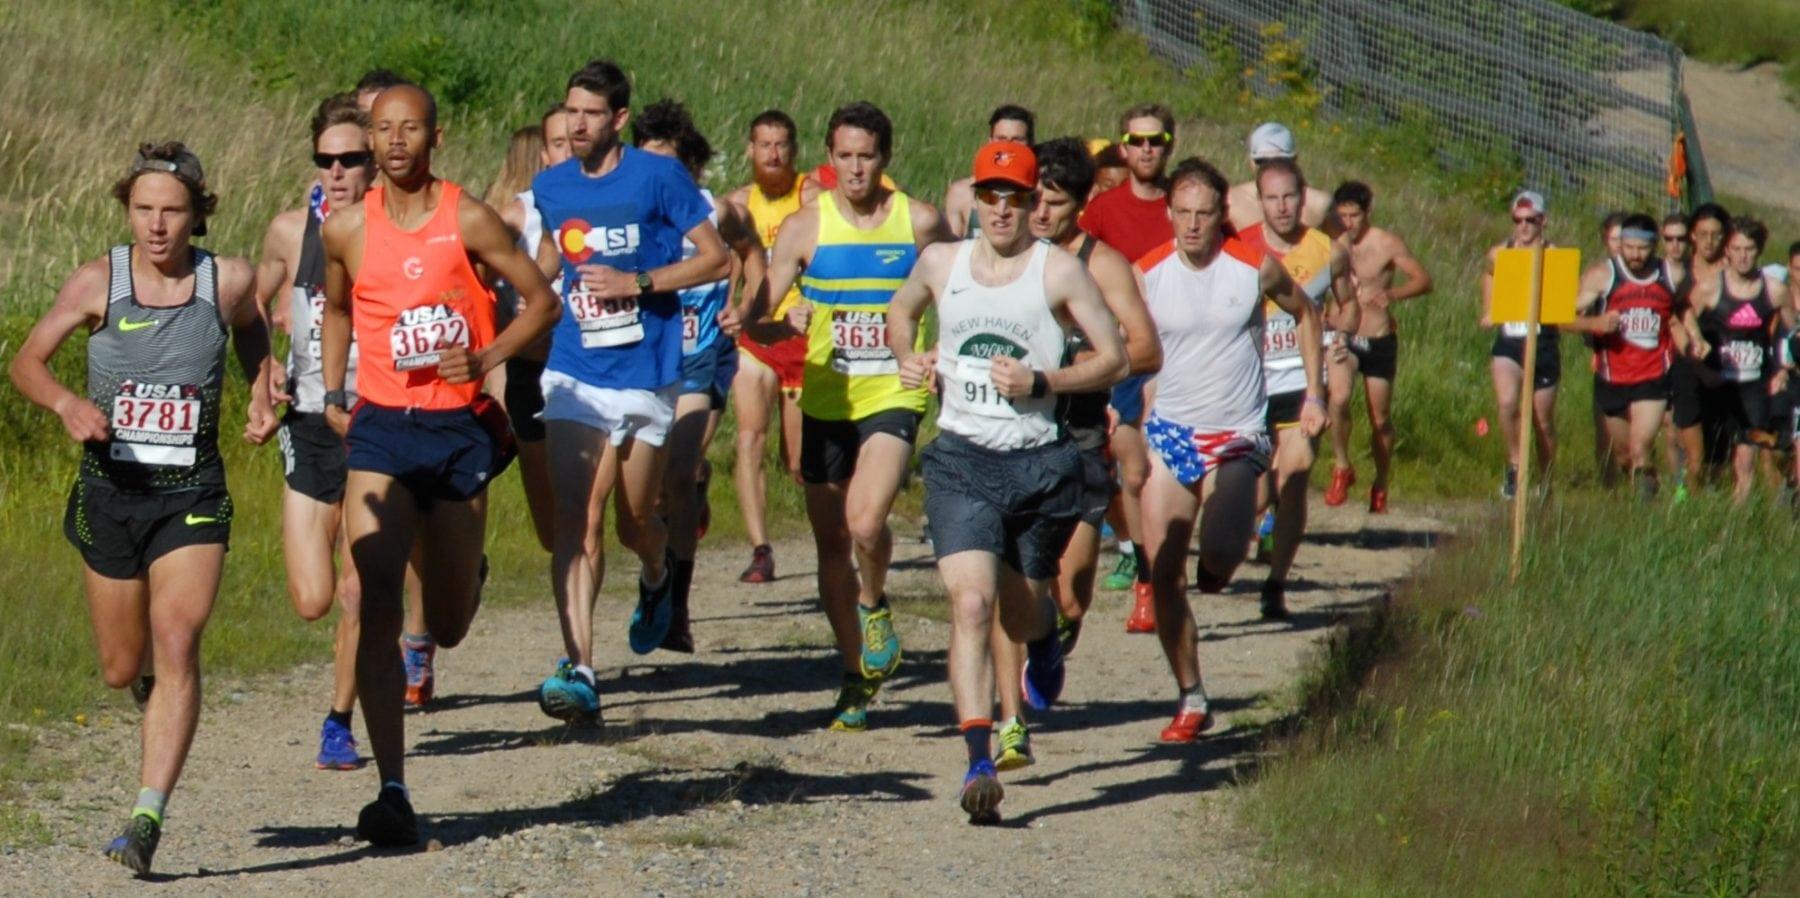 Start of the 2016 US Mountain Running Championships men's race